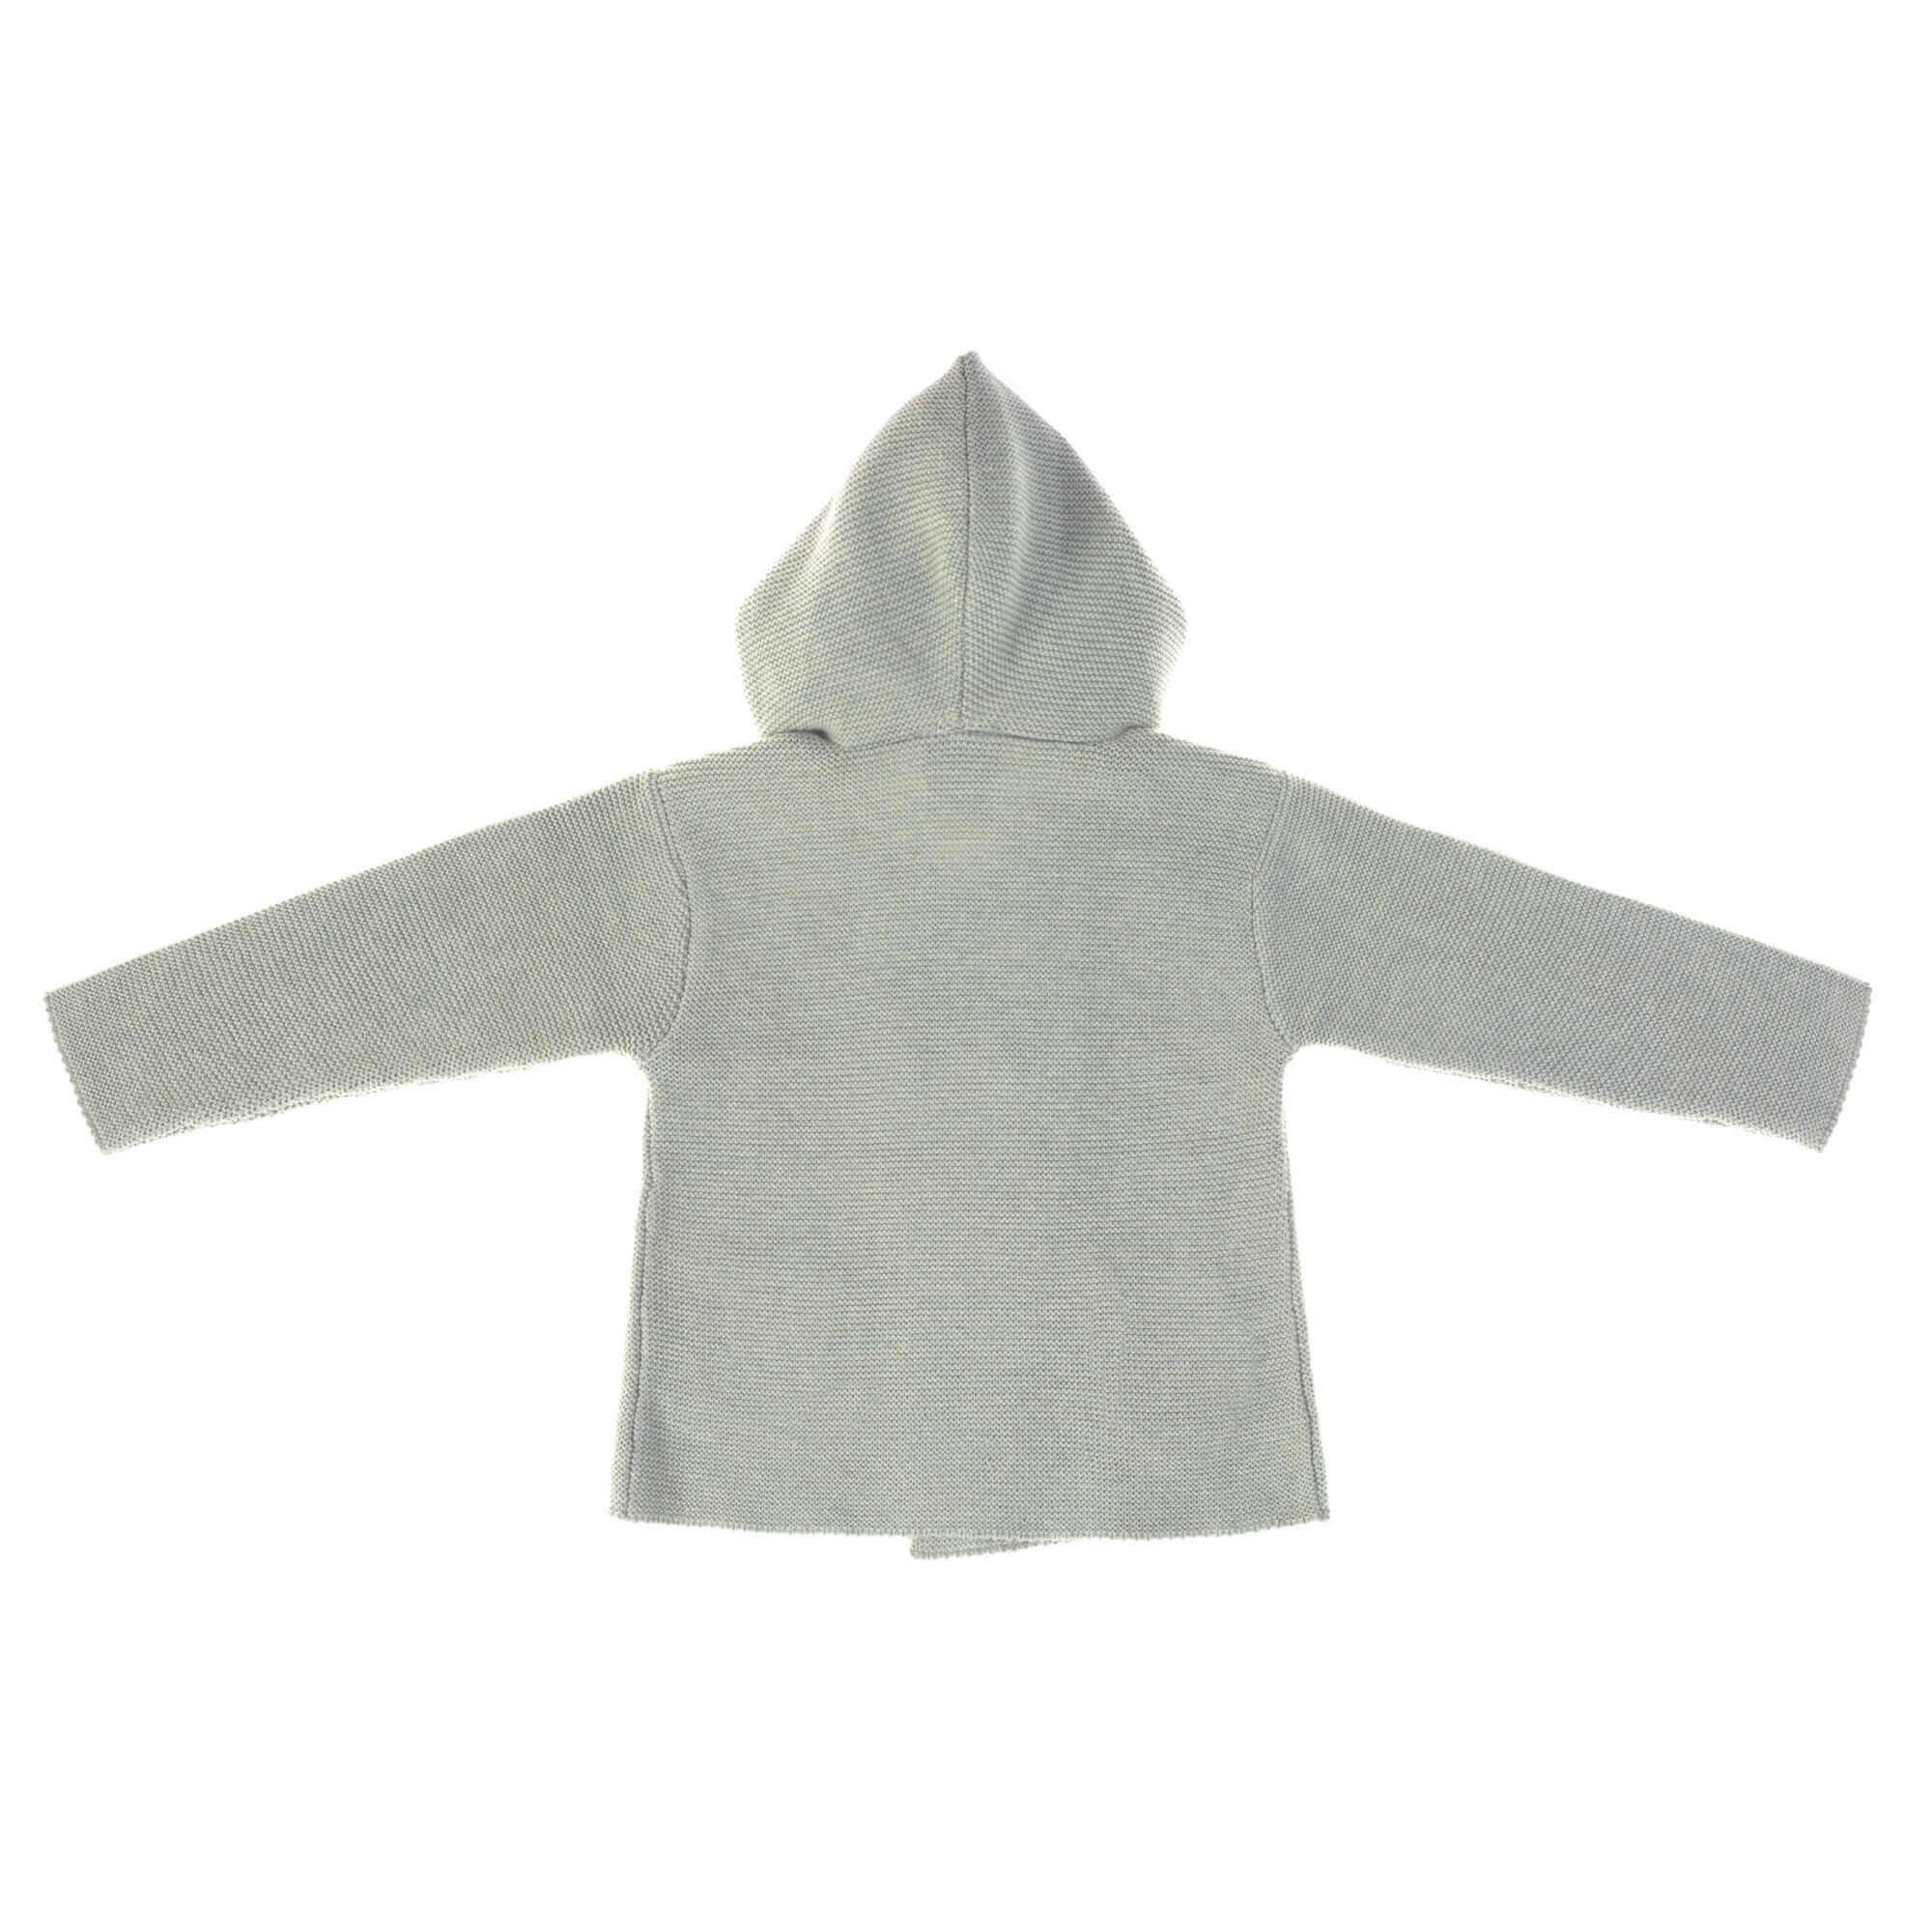 Lässig Lässig Baby gebreide hoodie GOTS - Garden Explorer aqua grijs maat 62-68 2-6mnd